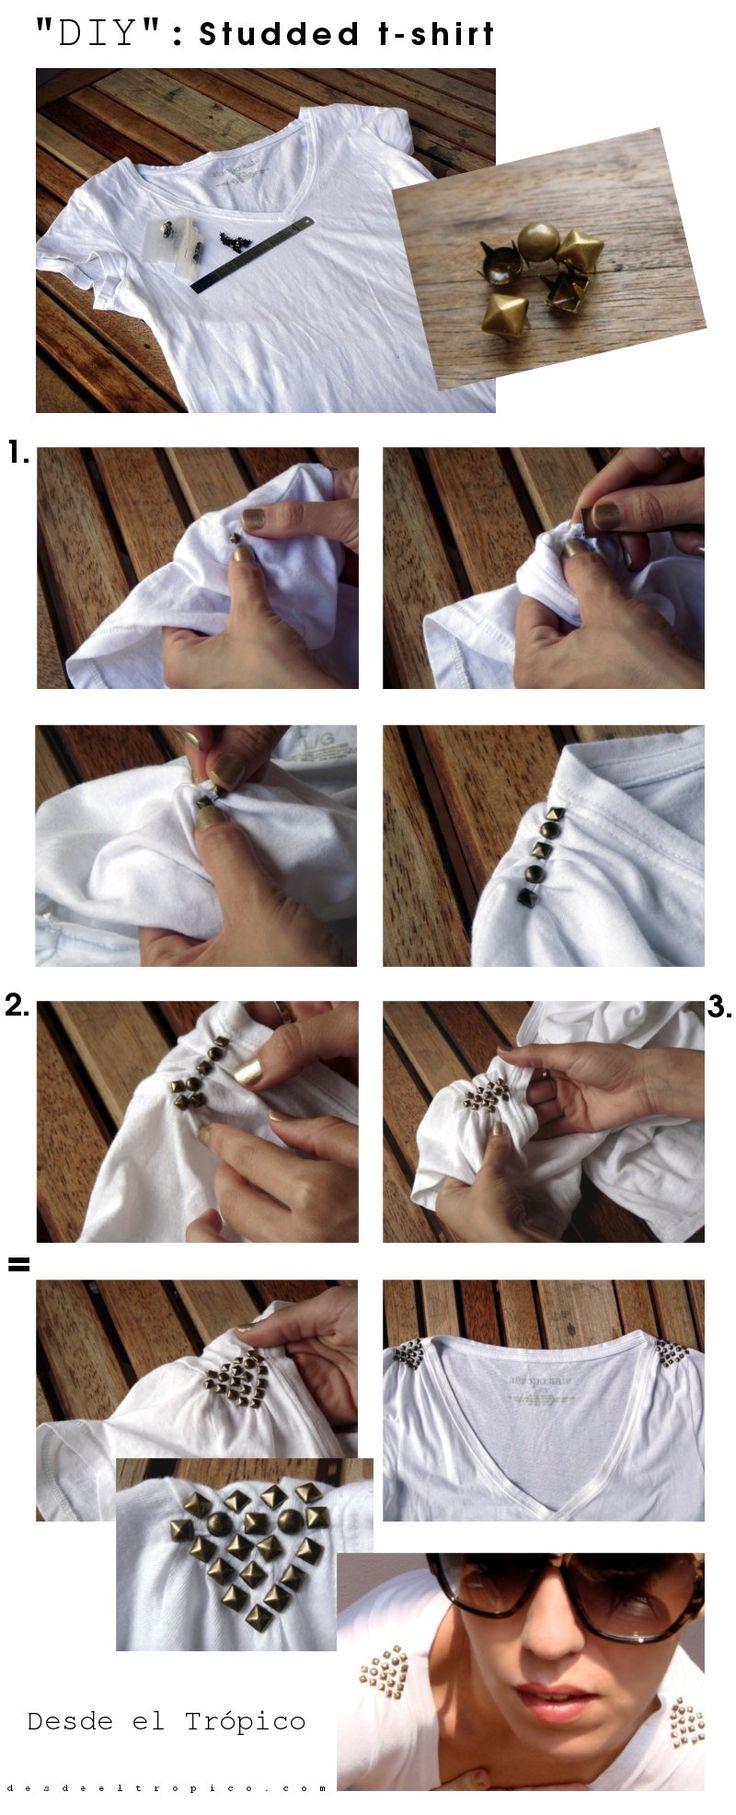 - camiseta con tachas-